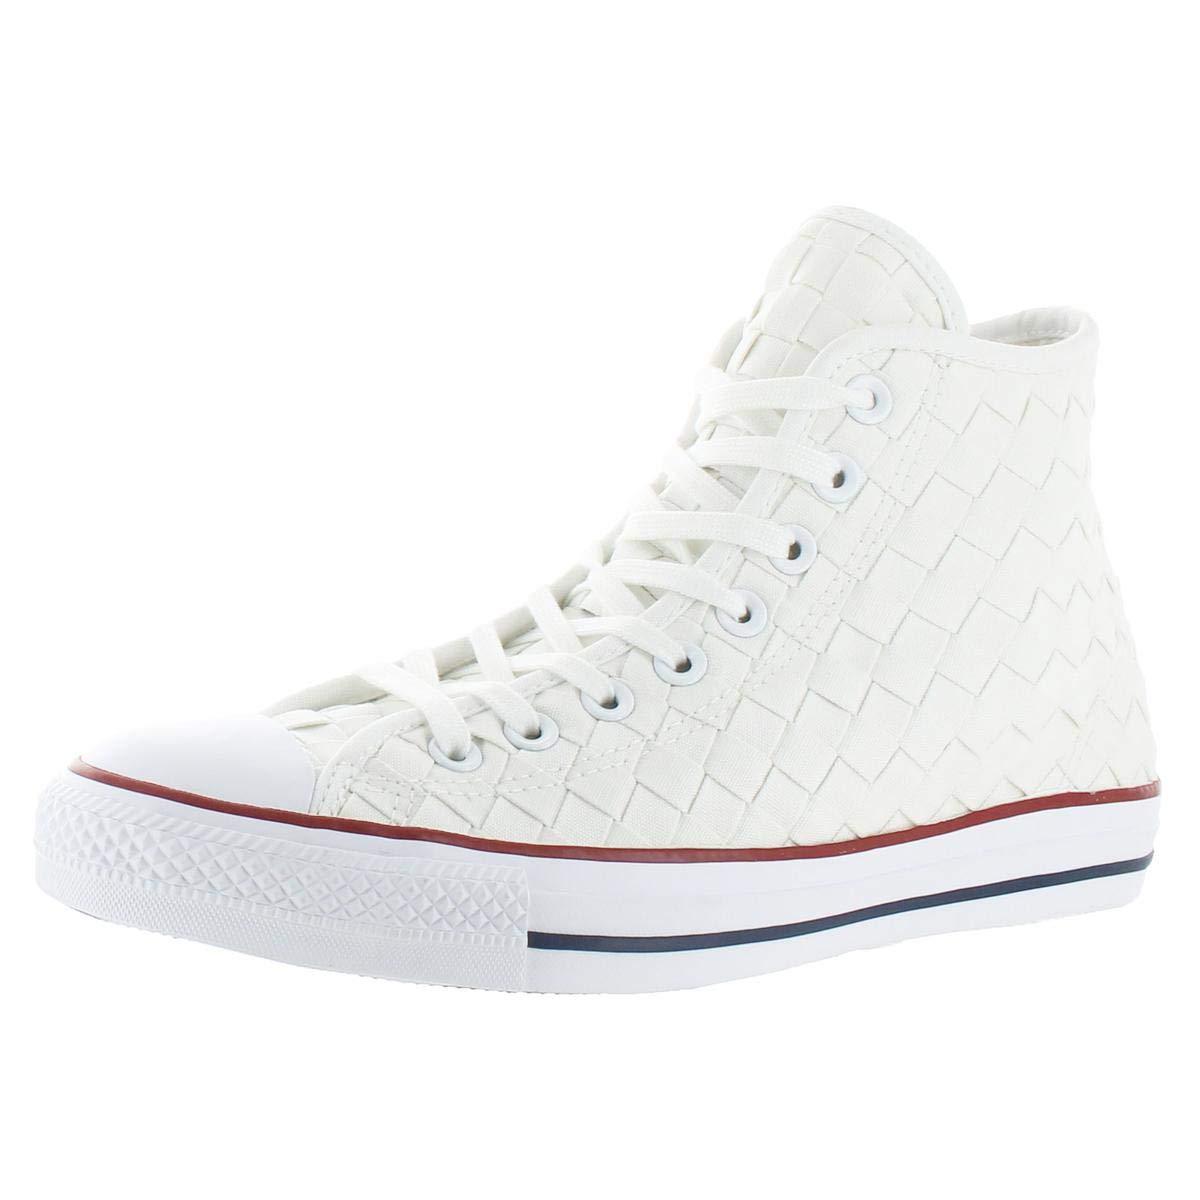 0c2d47f7c65e24 Galleon - Converse Men s Women s Chuck Taylor All Star Hi Woven  Casual Fashion Sneakers (10 B(M) US Women   8 D(M) US Men)